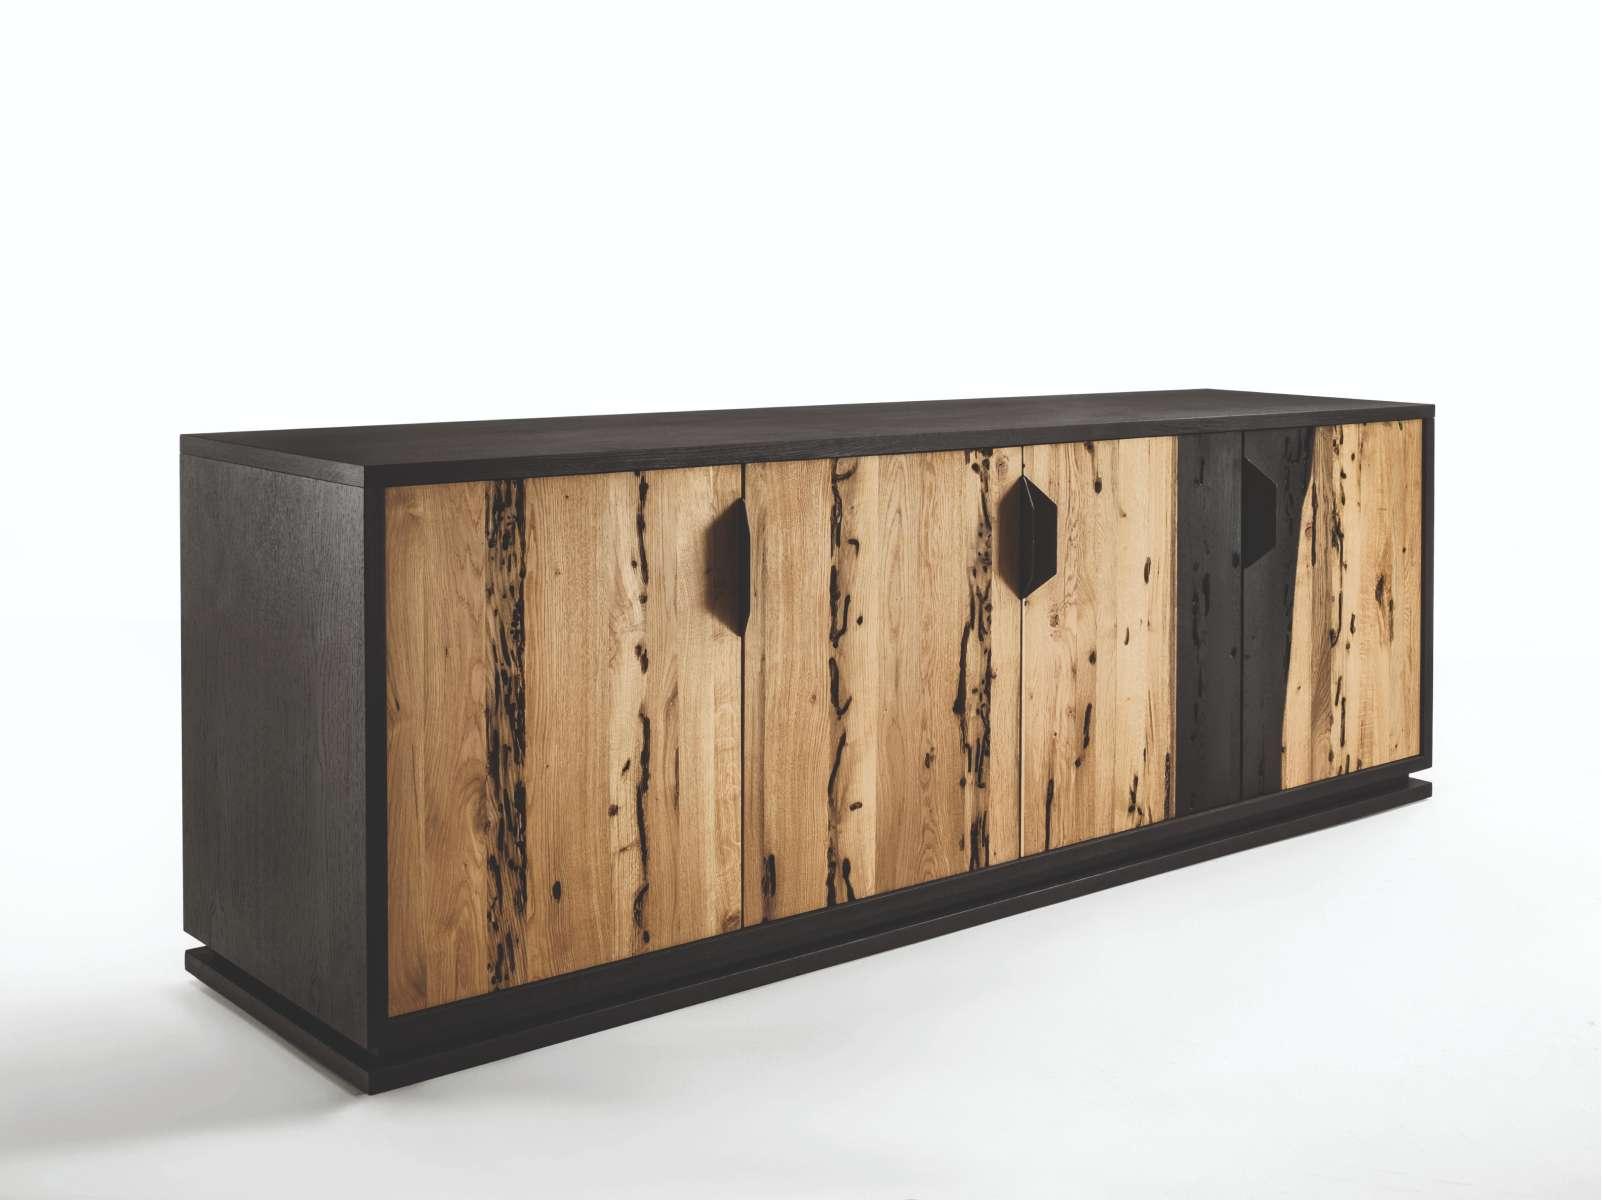 Studio Marco Piva – Product design – 608